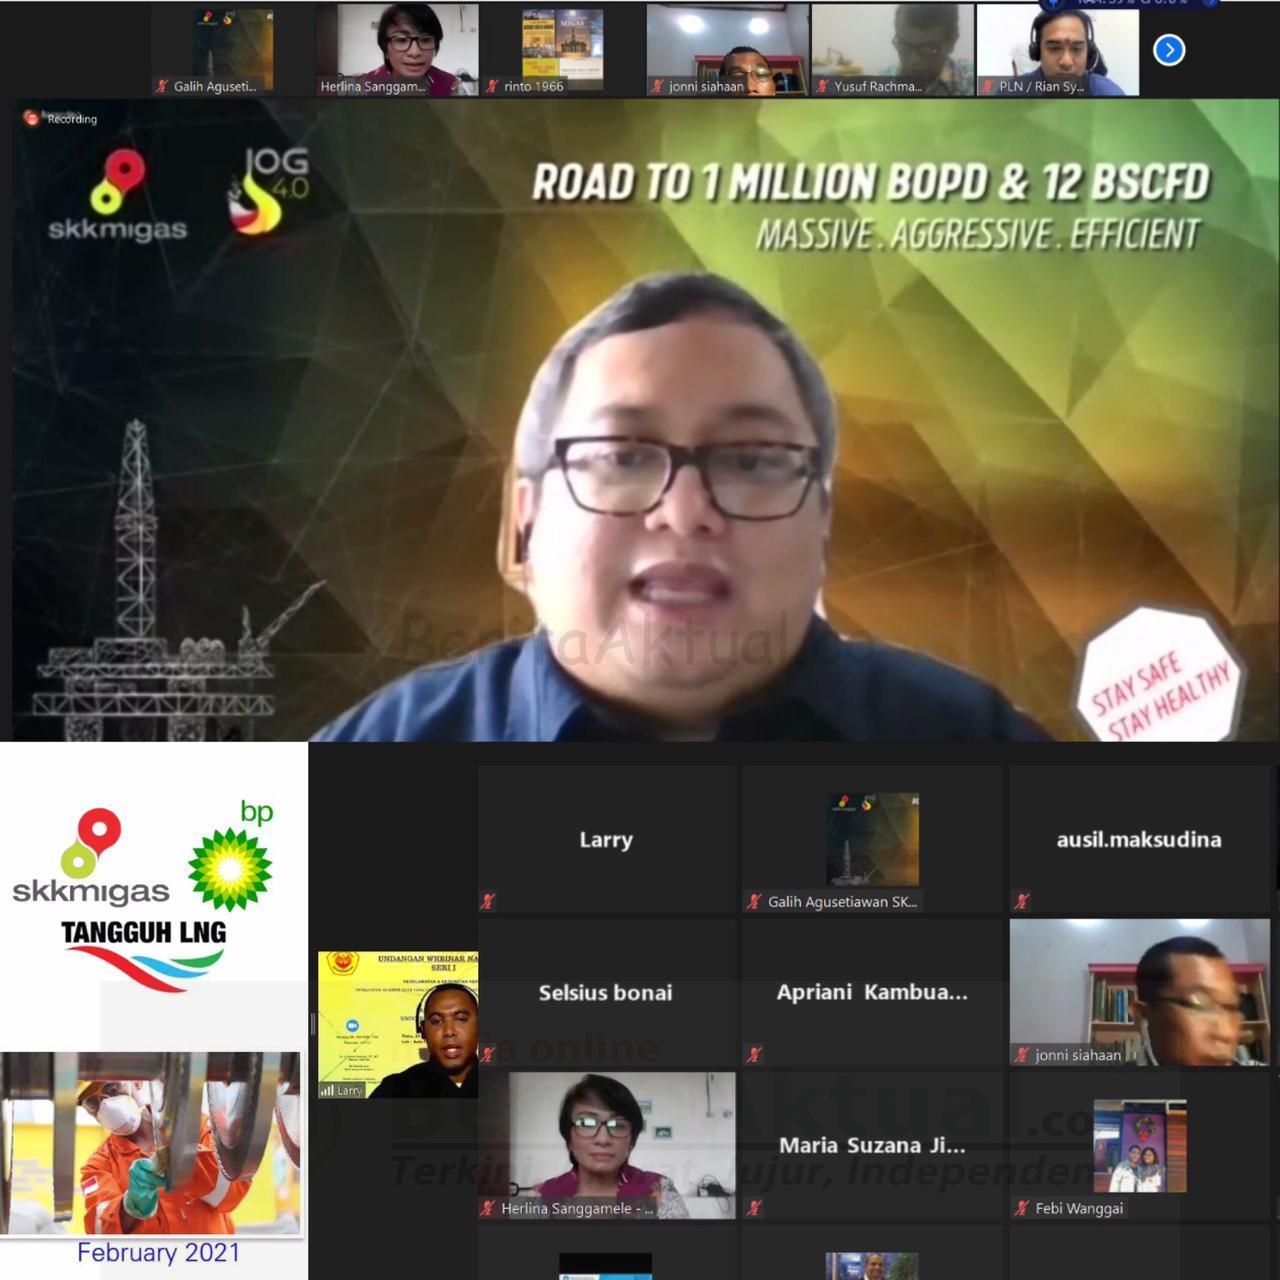 Industri Hulu Migas Wil Papua Maluku Dukung Pencanangan Bulan K3 Bersama Civitas Akademika Uncen 25 IMG 20210225 WA0001